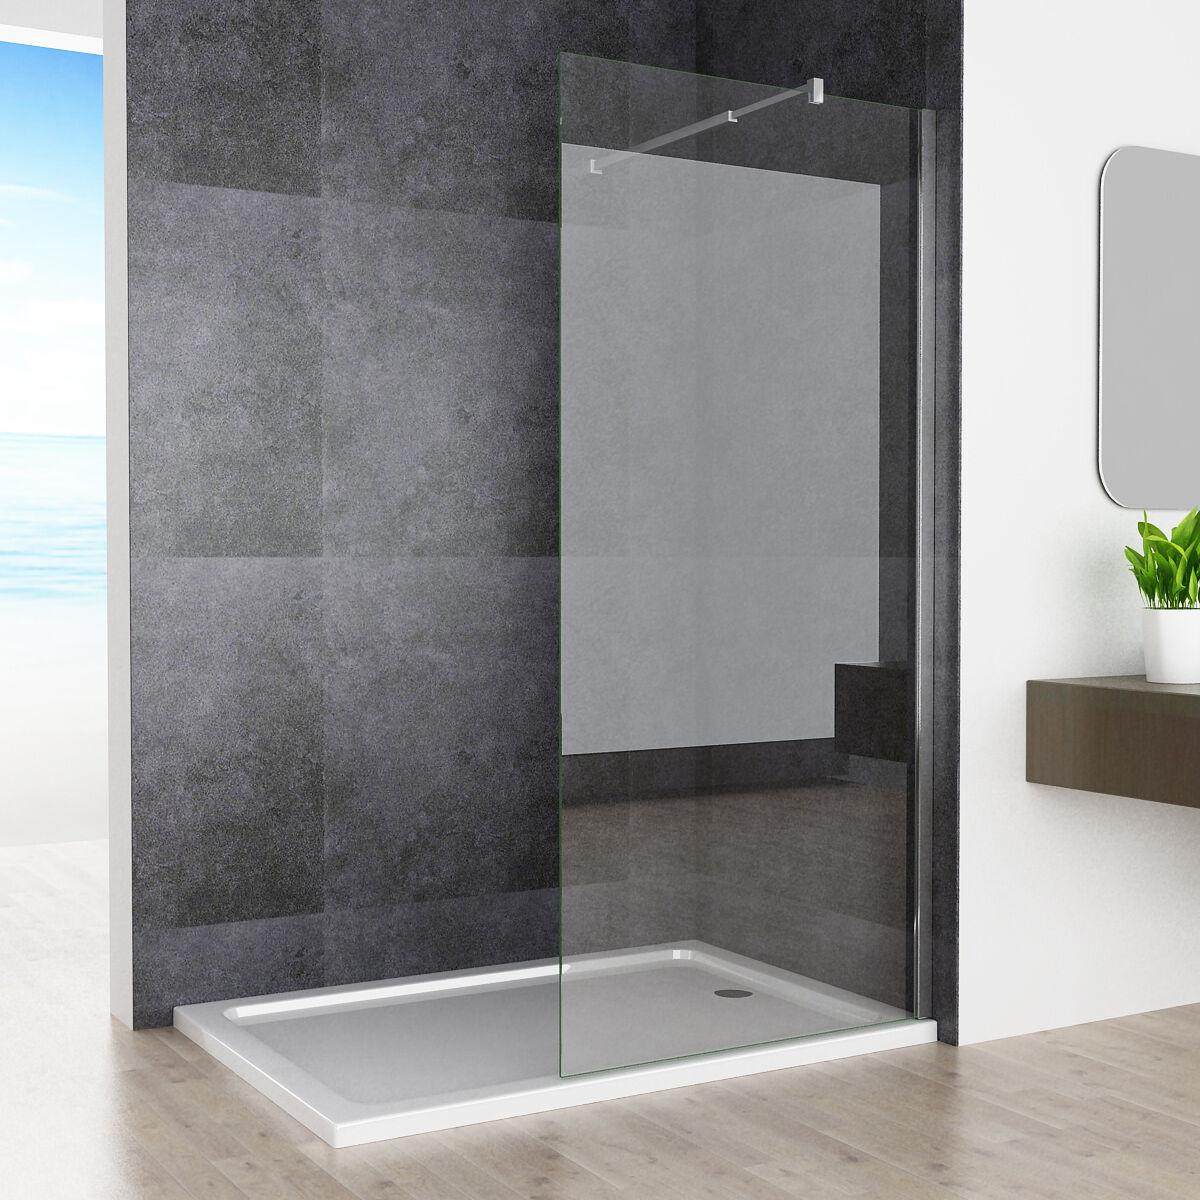 walk in dusche duschwand duschtrennwand duschabtrennung 6mm 10mm nano esg glas. Black Bedroom Furniture Sets. Home Design Ideas